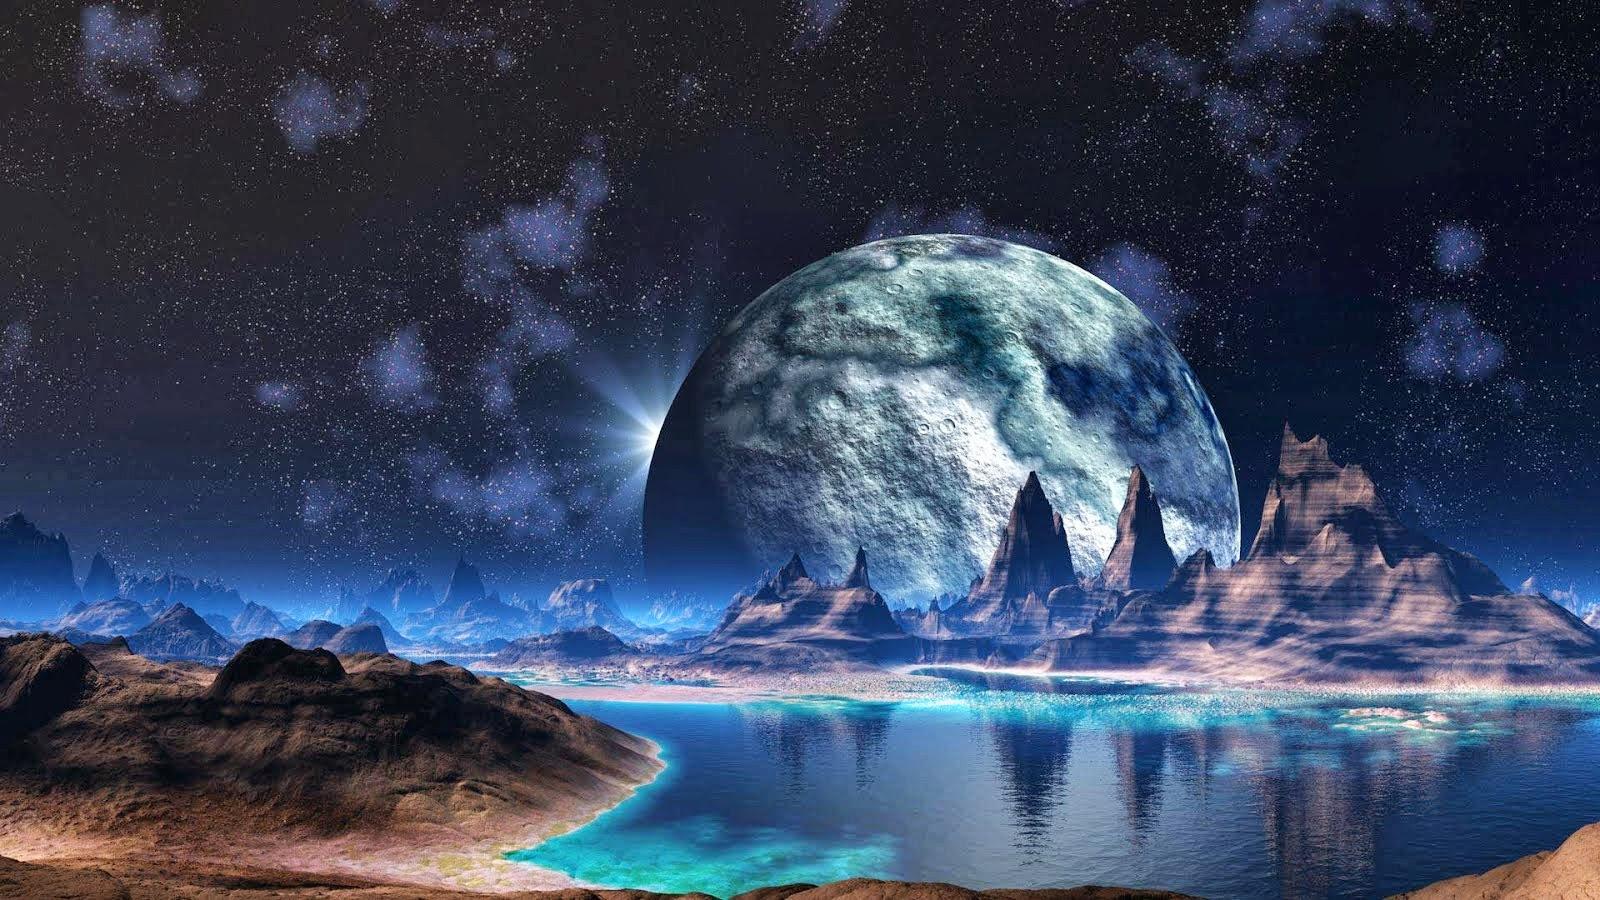 Space art wallpaper hd